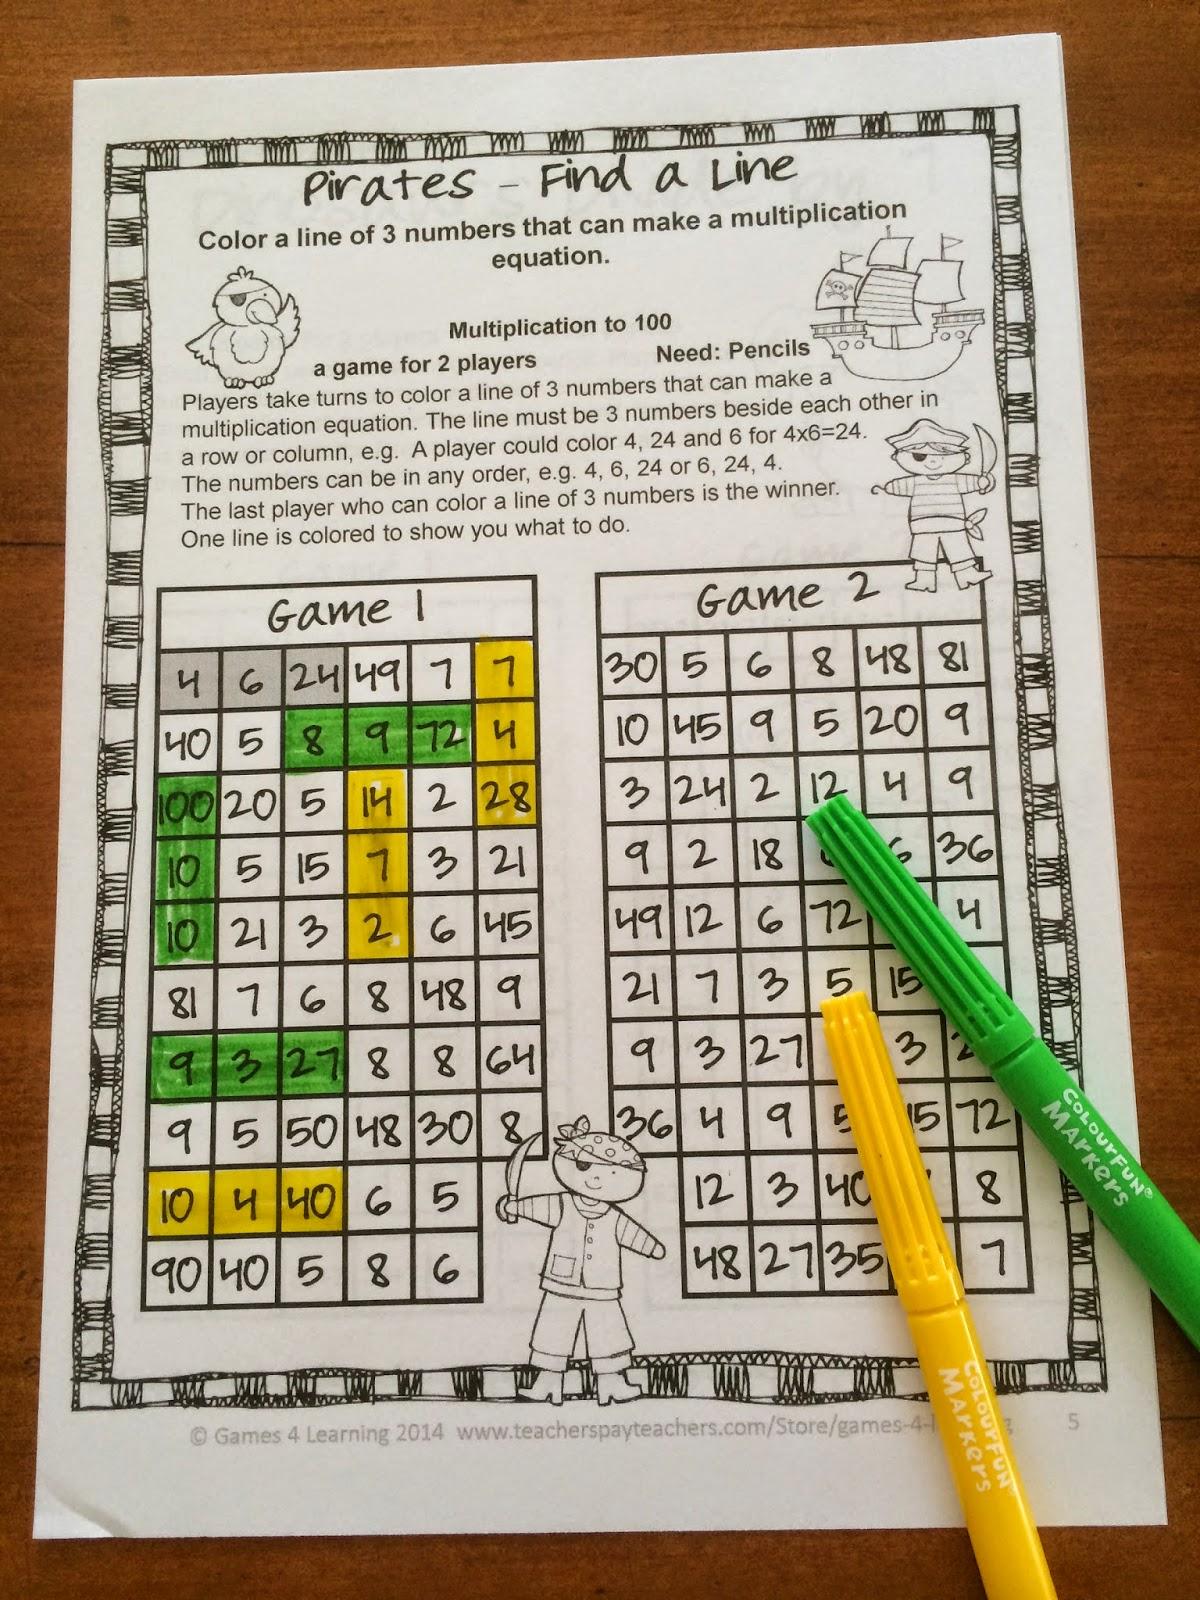 Fun Games 4 Learning More No Prep Math Games Freebies